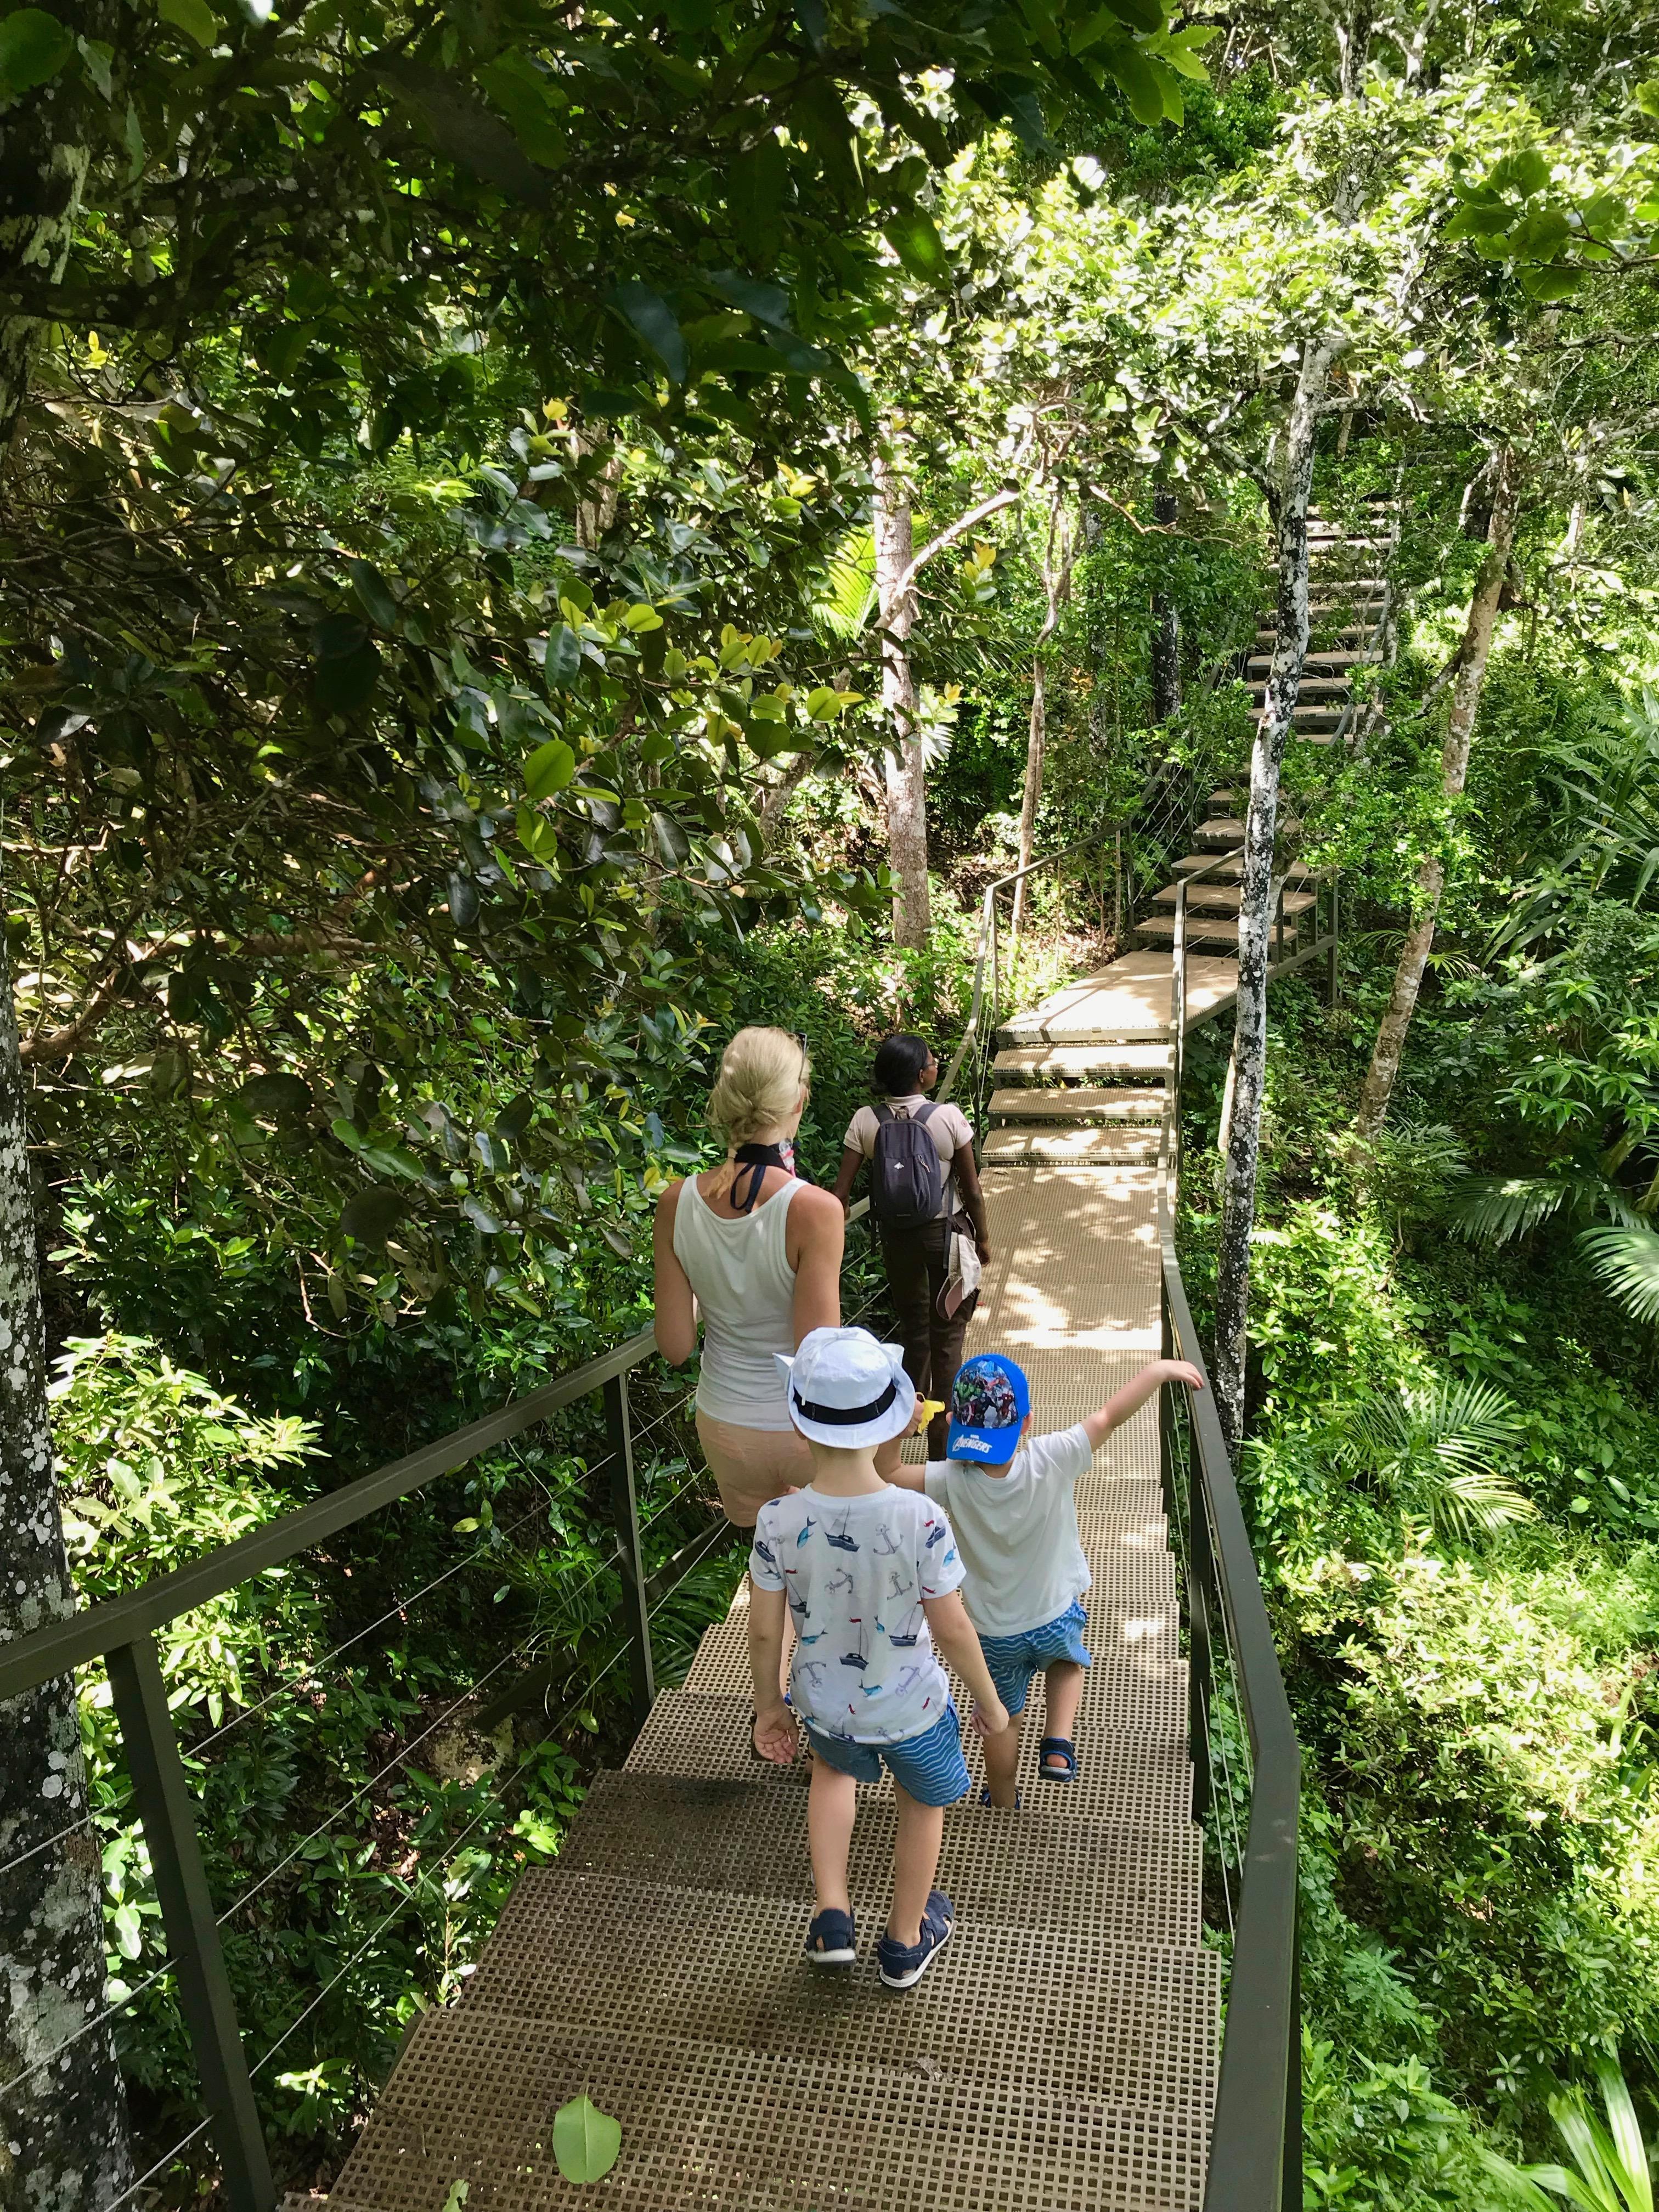 Jungle trekking with children in Mauritius